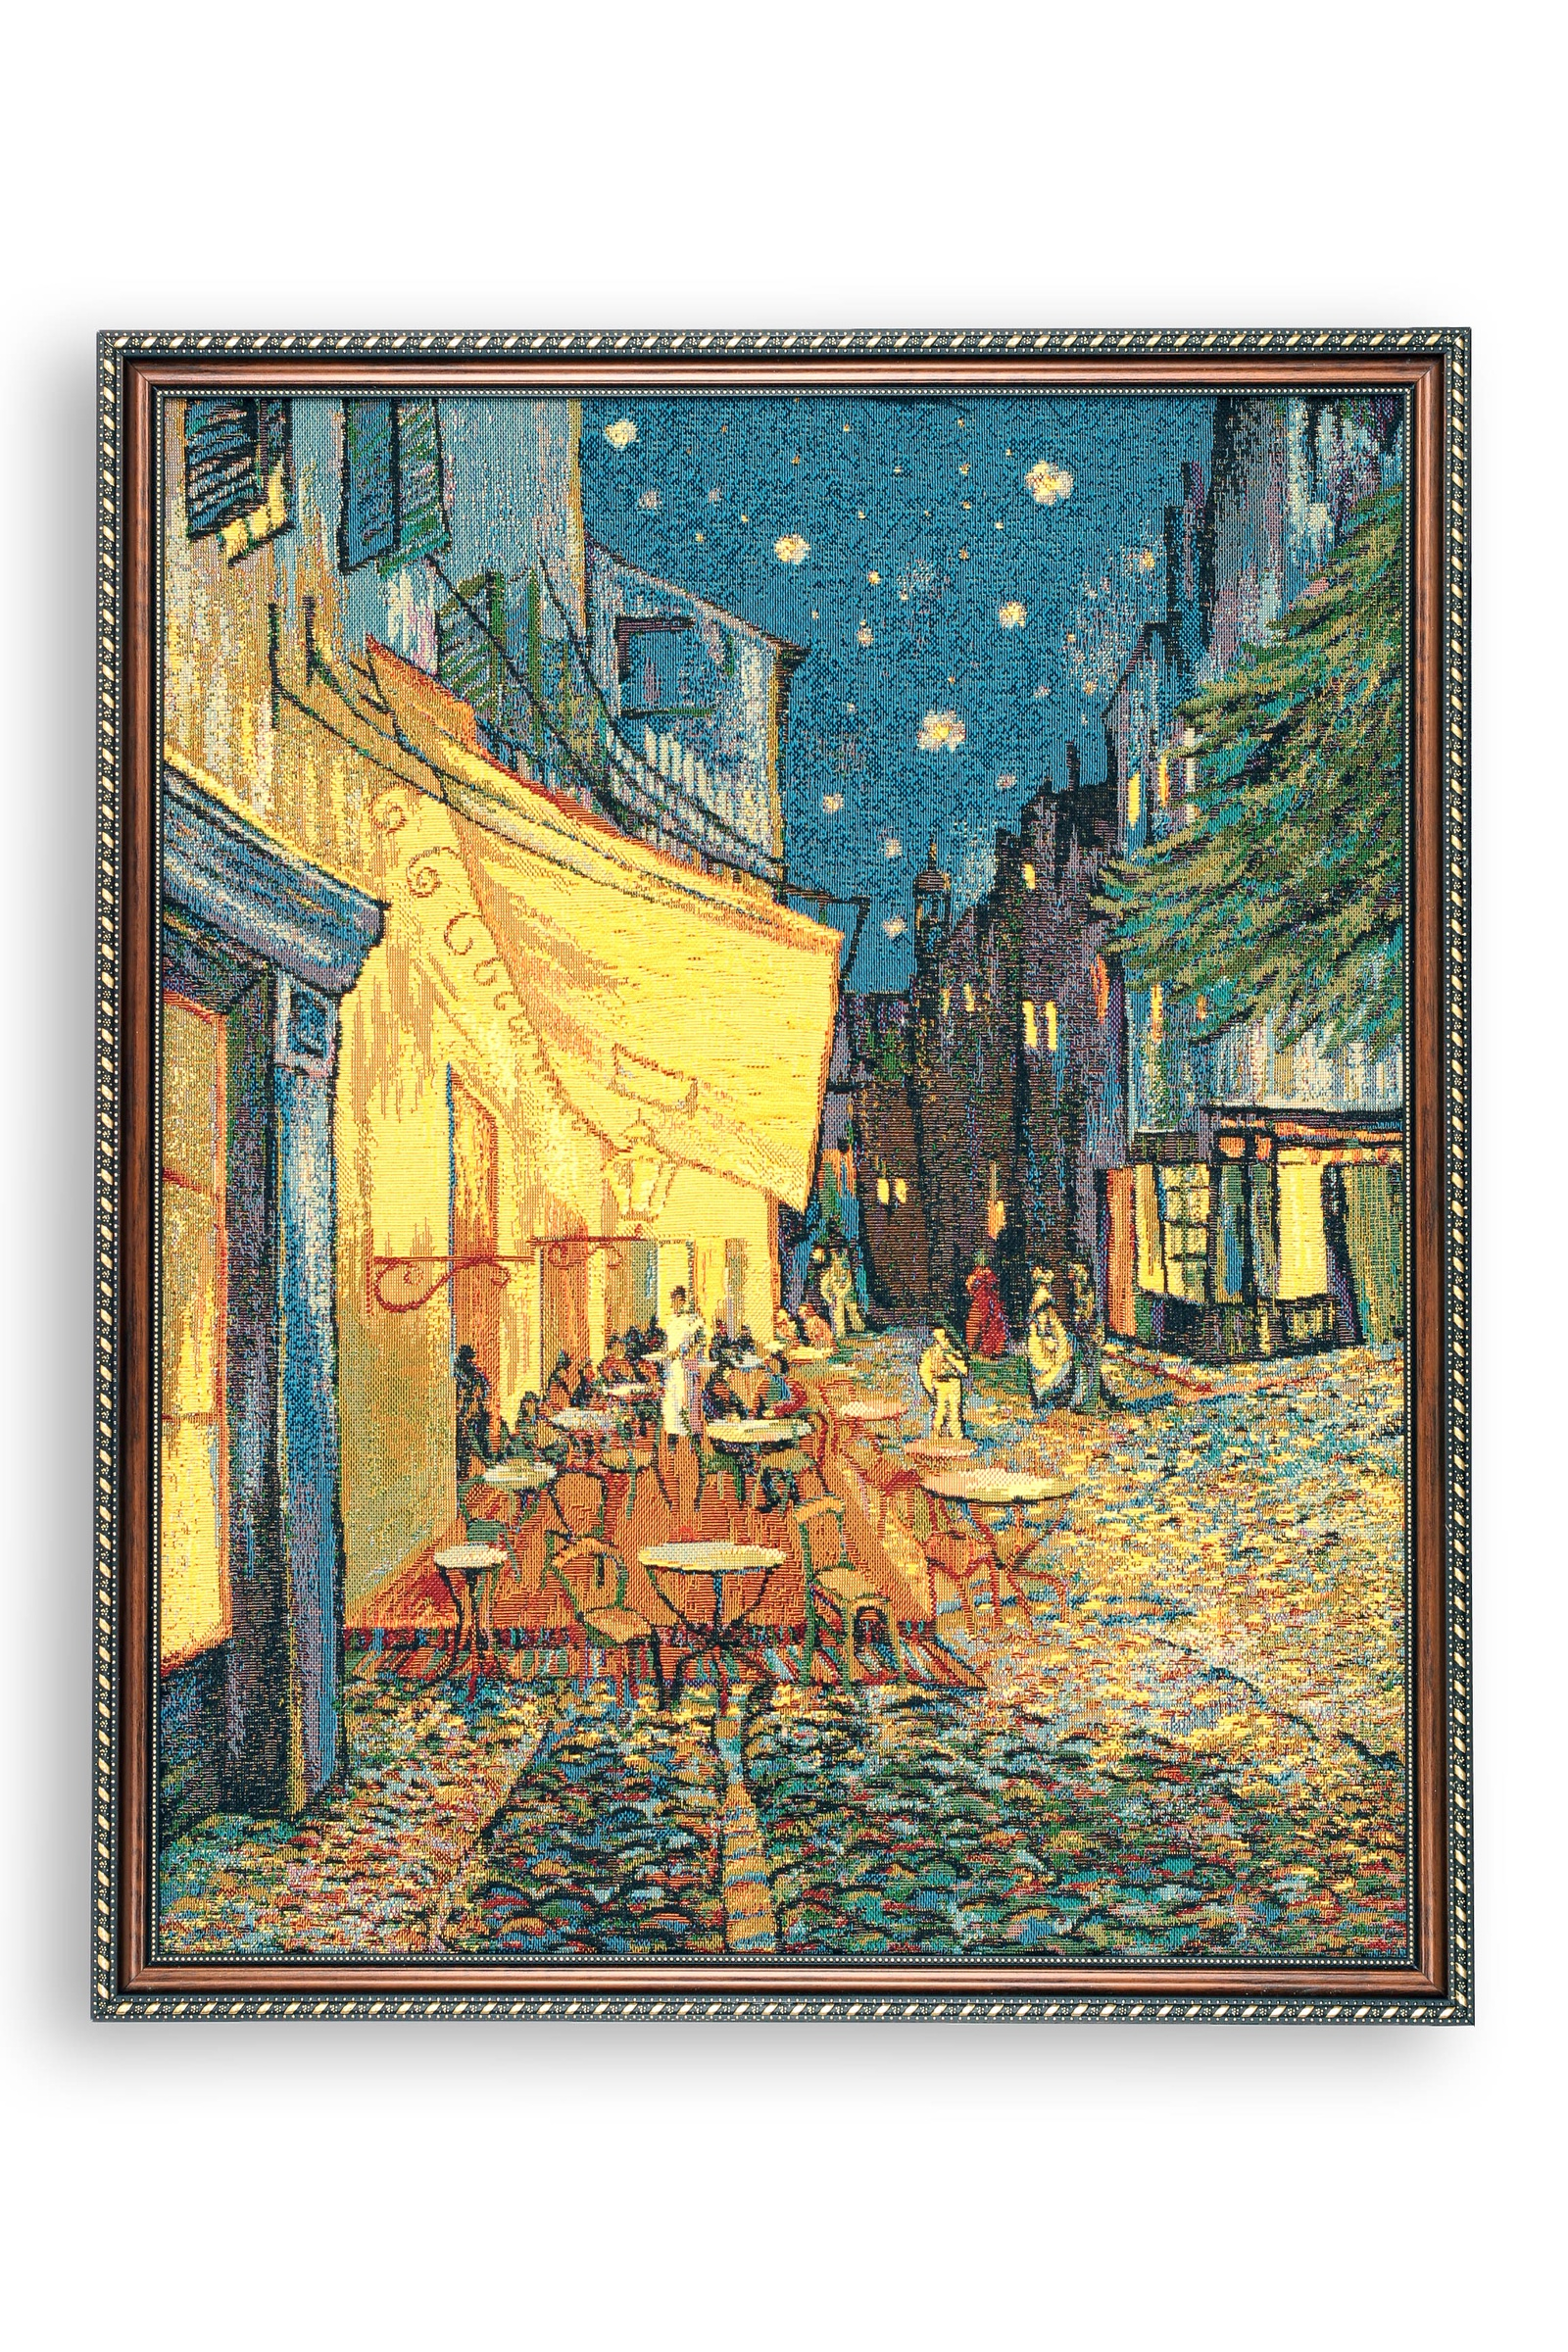 Картина Магазин гобеленов Ван Гог терраса ночного кафе 56*70 см, Гобелен закладка с резинкой ван гог ночная терраса кафе арте